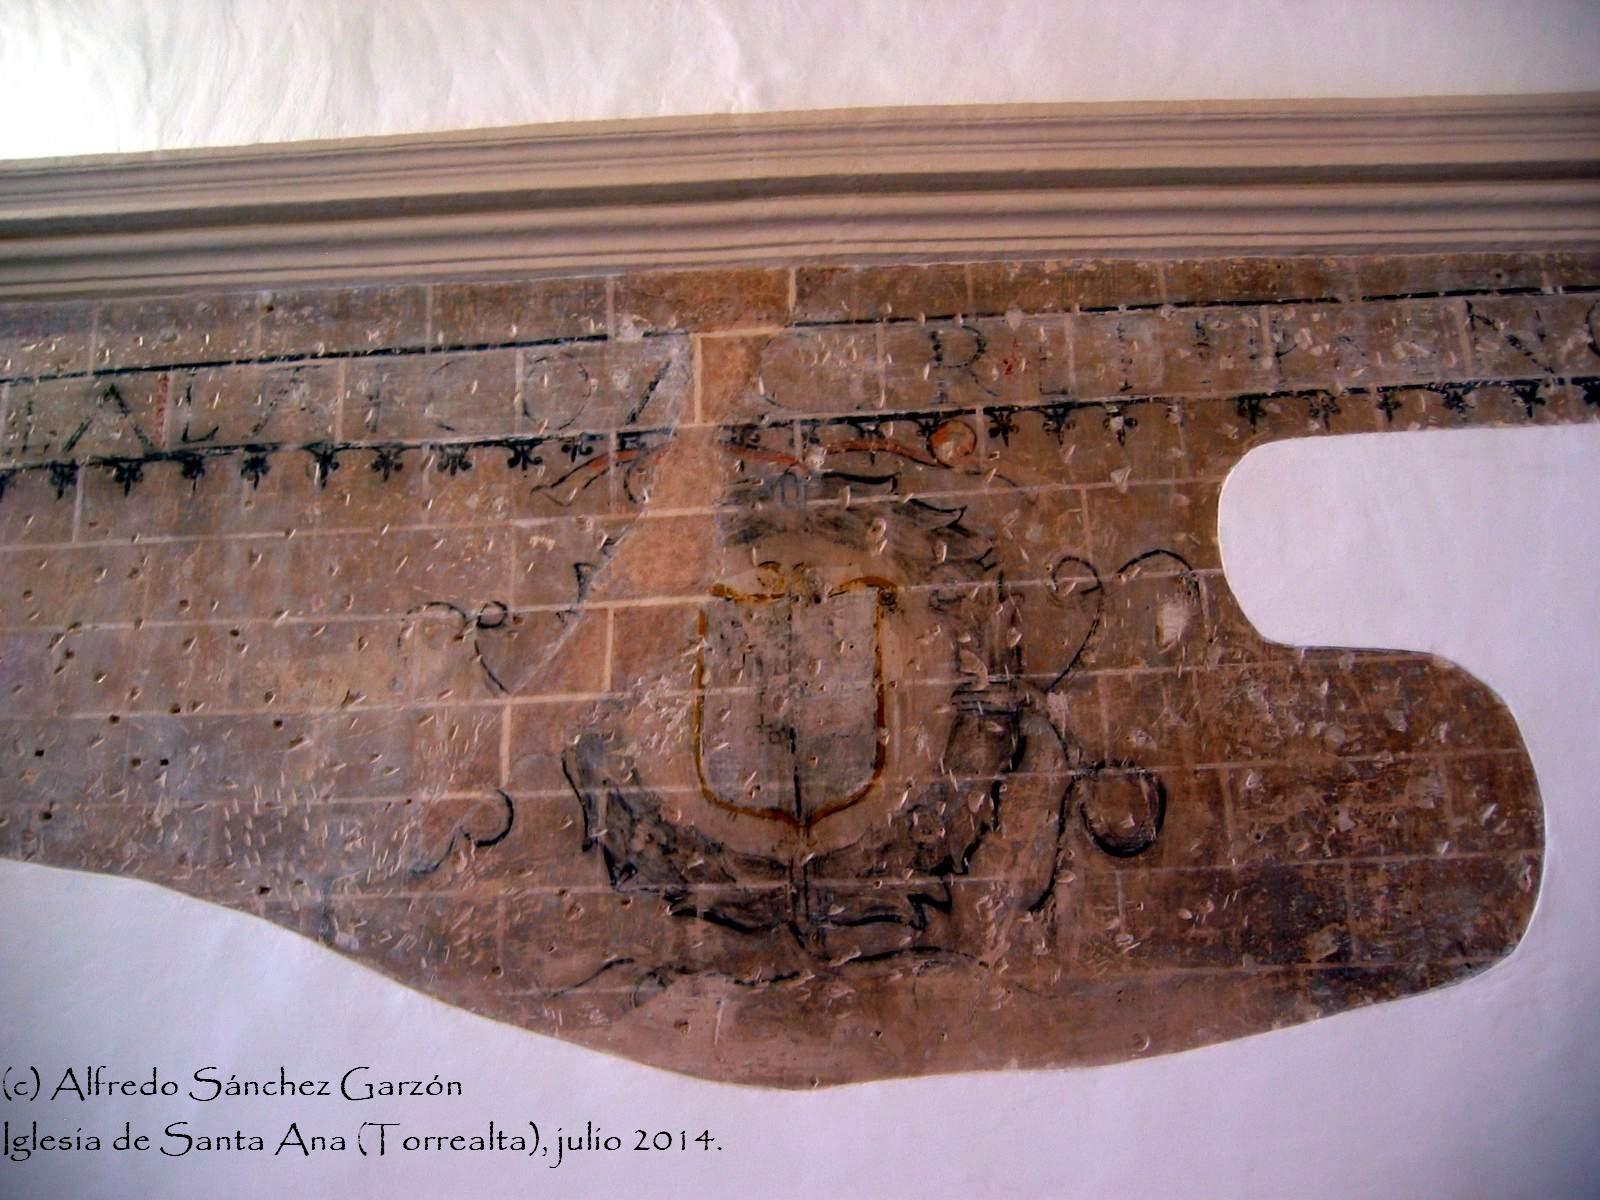 iglesia-santa-ana-torrealta-escudo-senorial